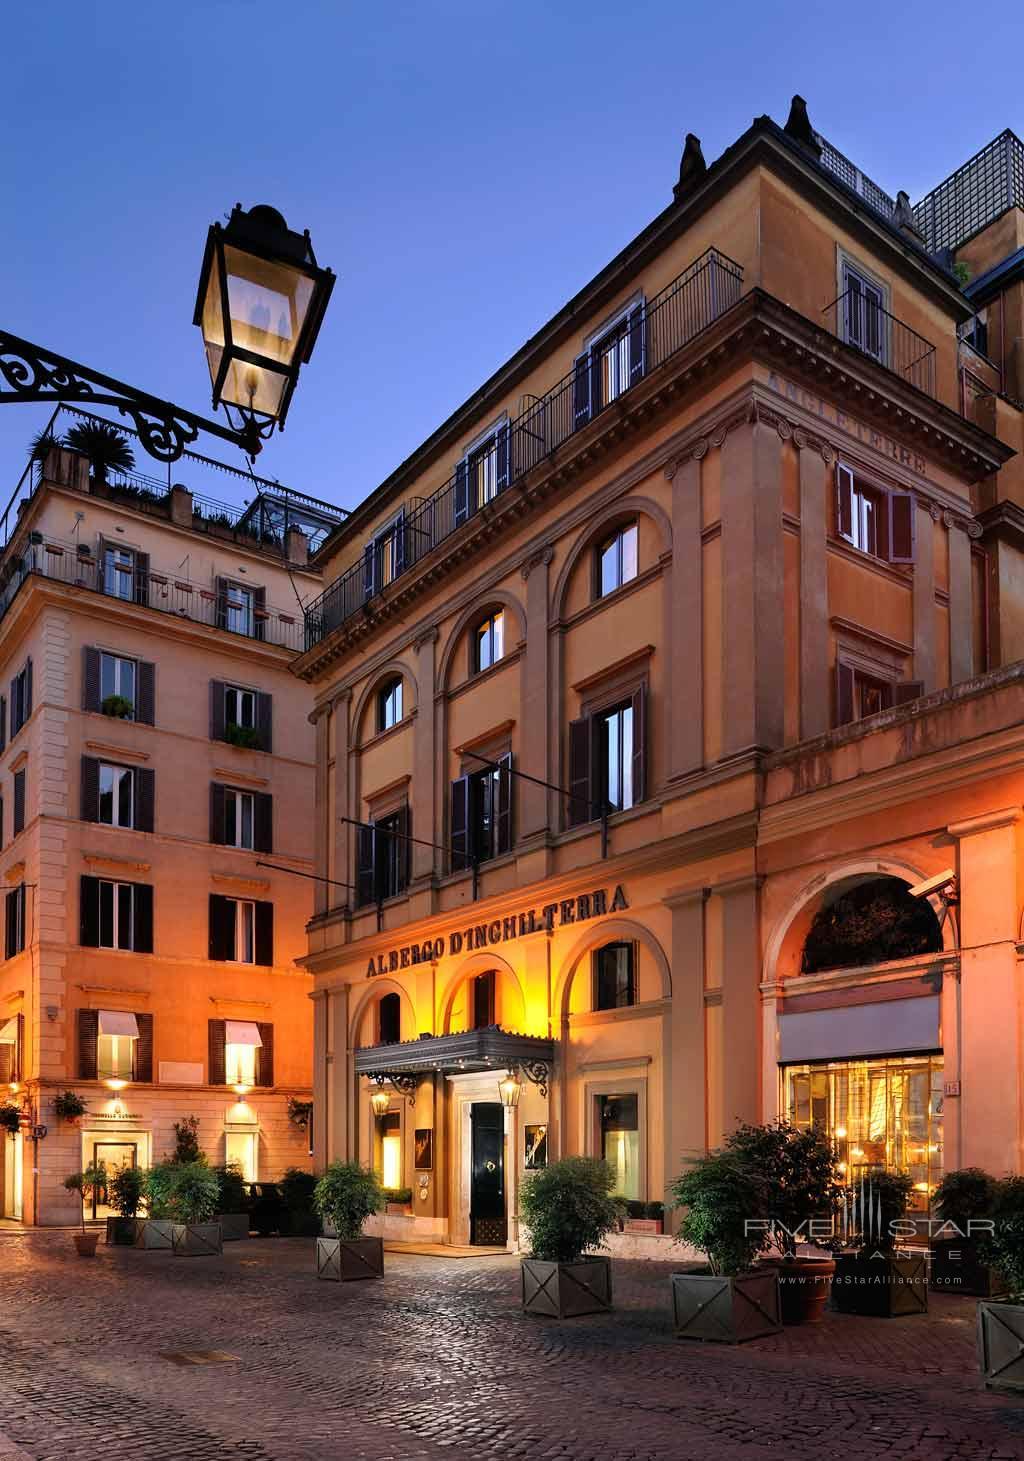 Hotel d'Inghilterra Rome, Italy